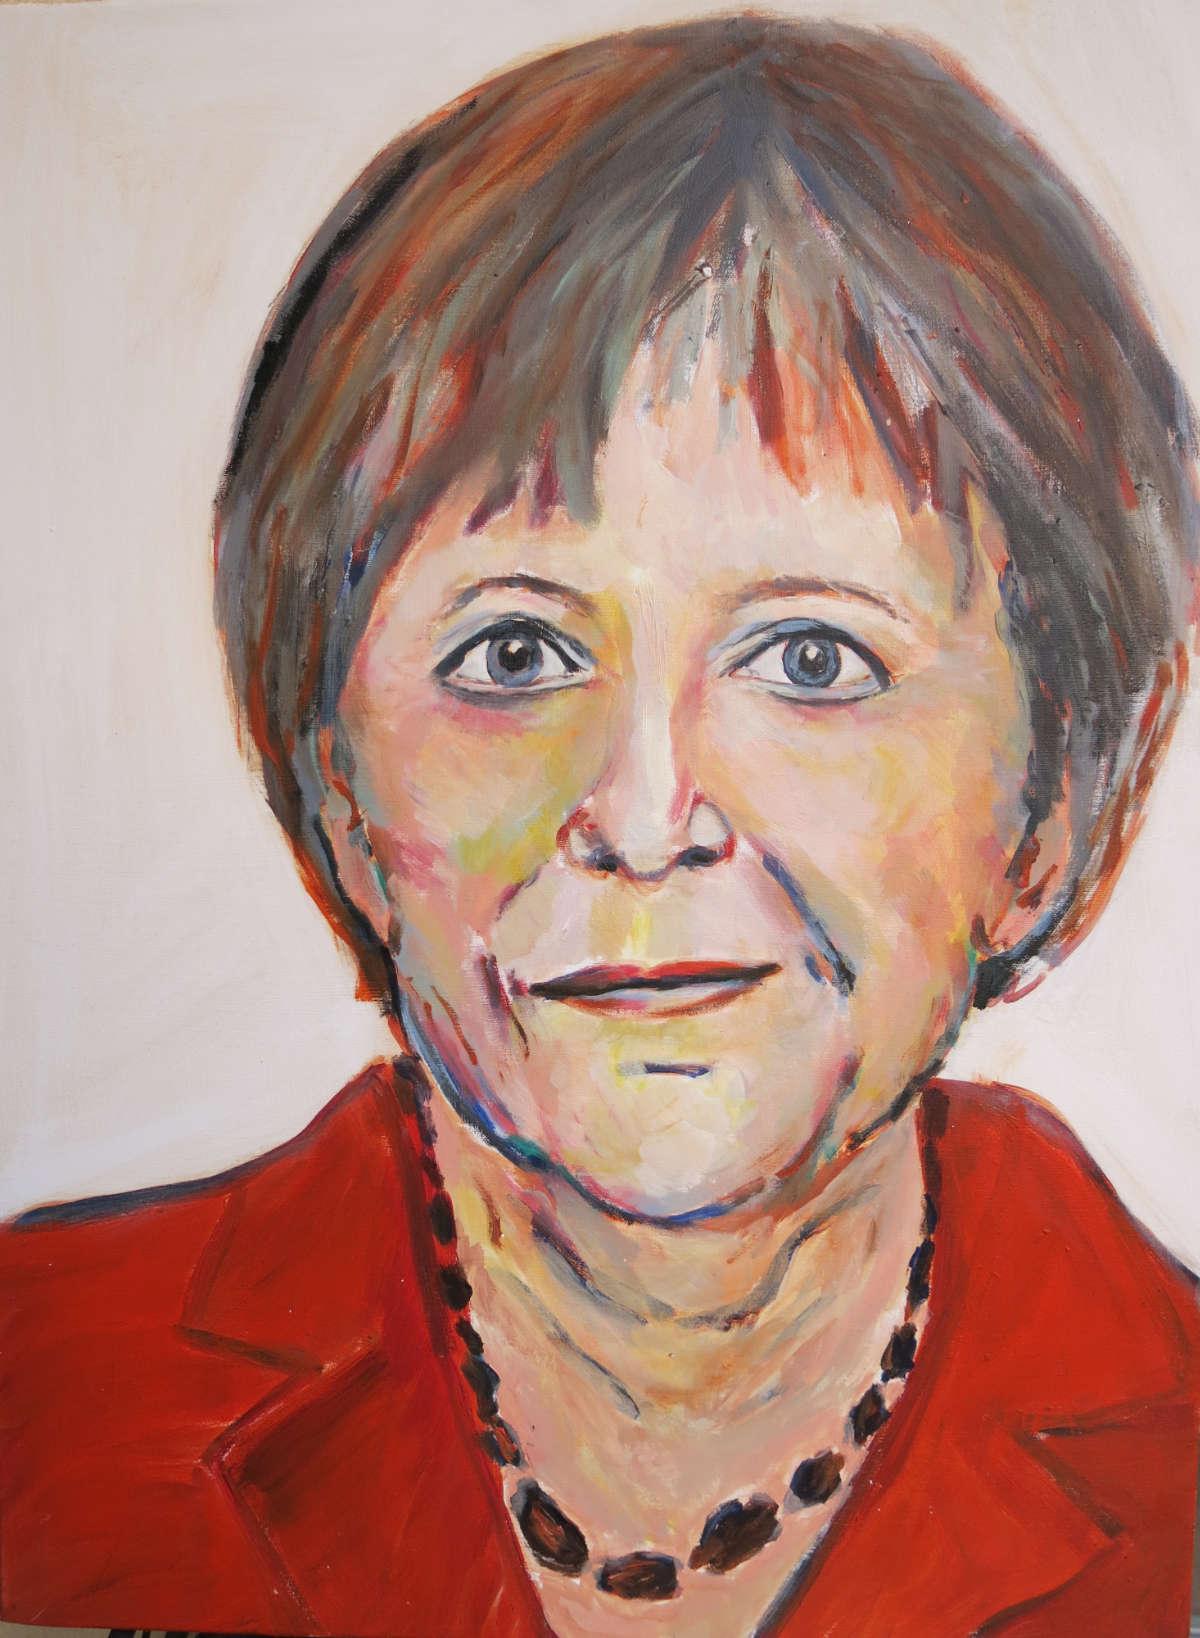 Angela Merkel, Acryl auf Leinwand, 80x60cm, 2016